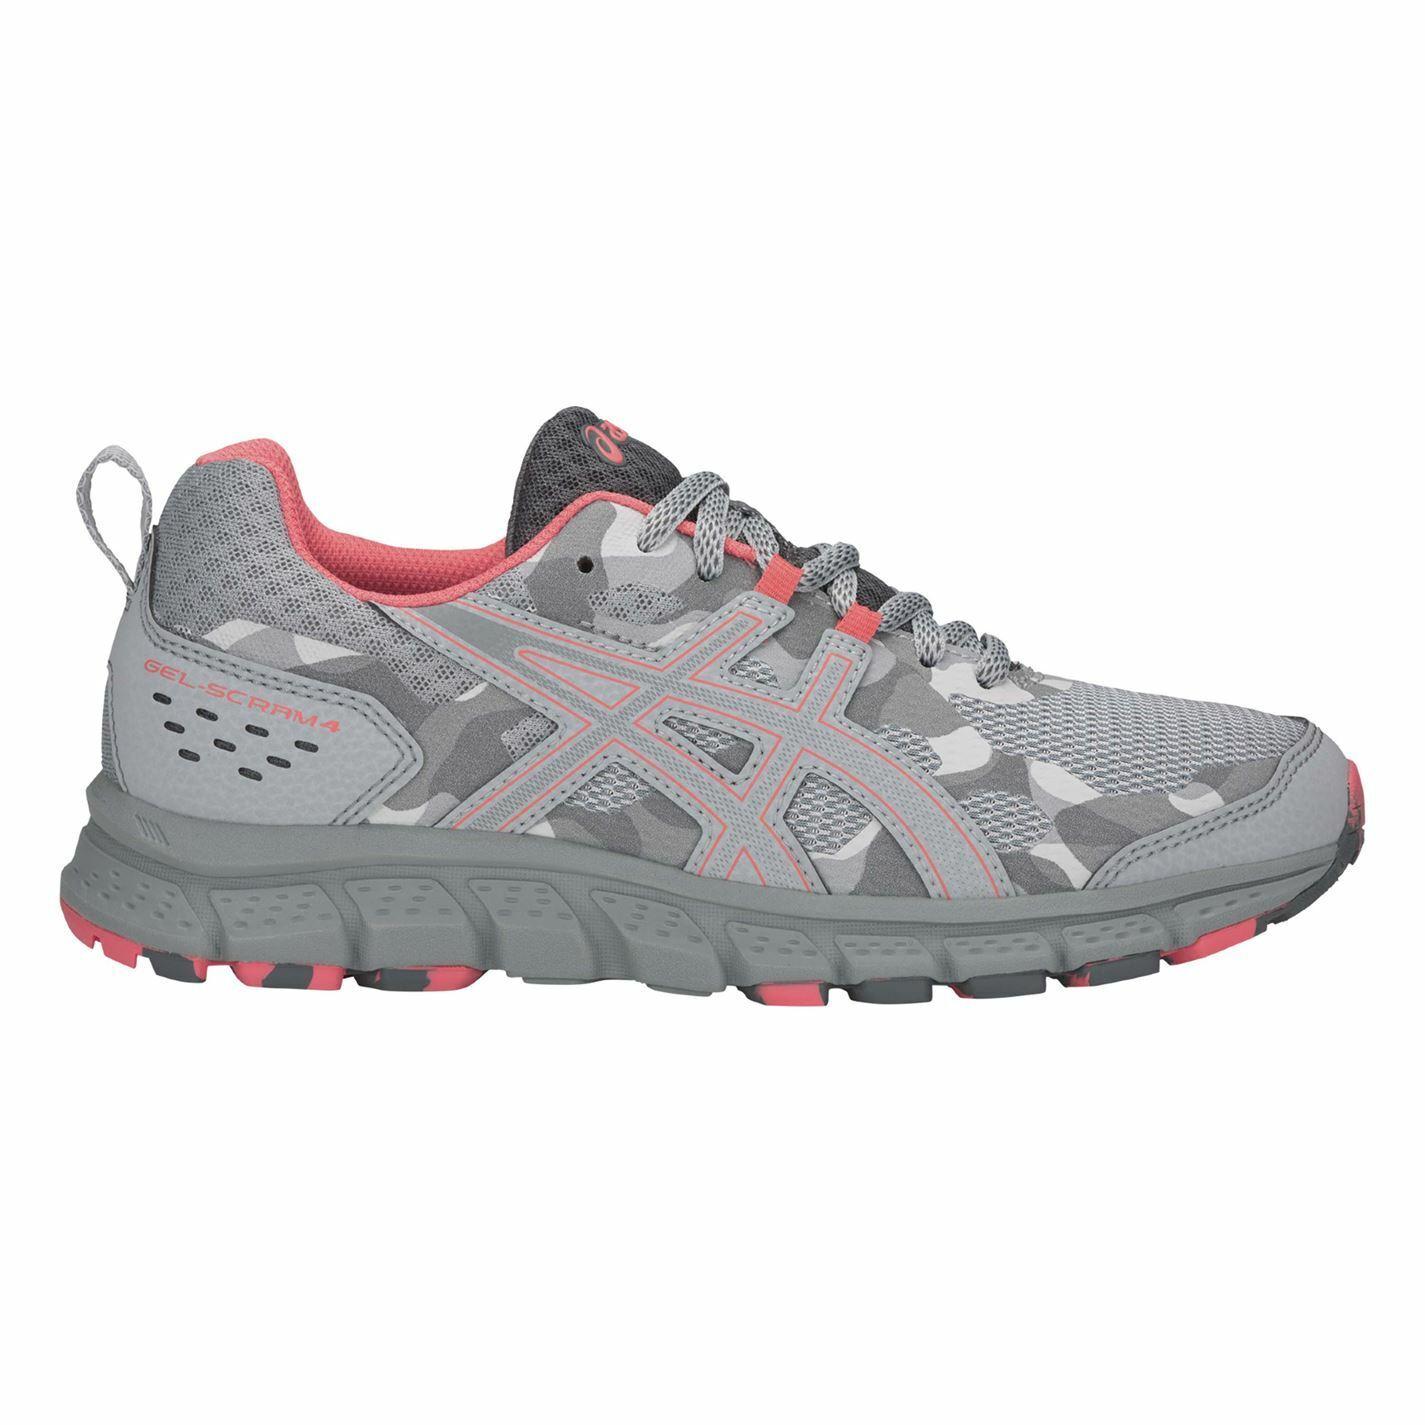 Asics Womens Gel Scram 4 Trail Running shoes